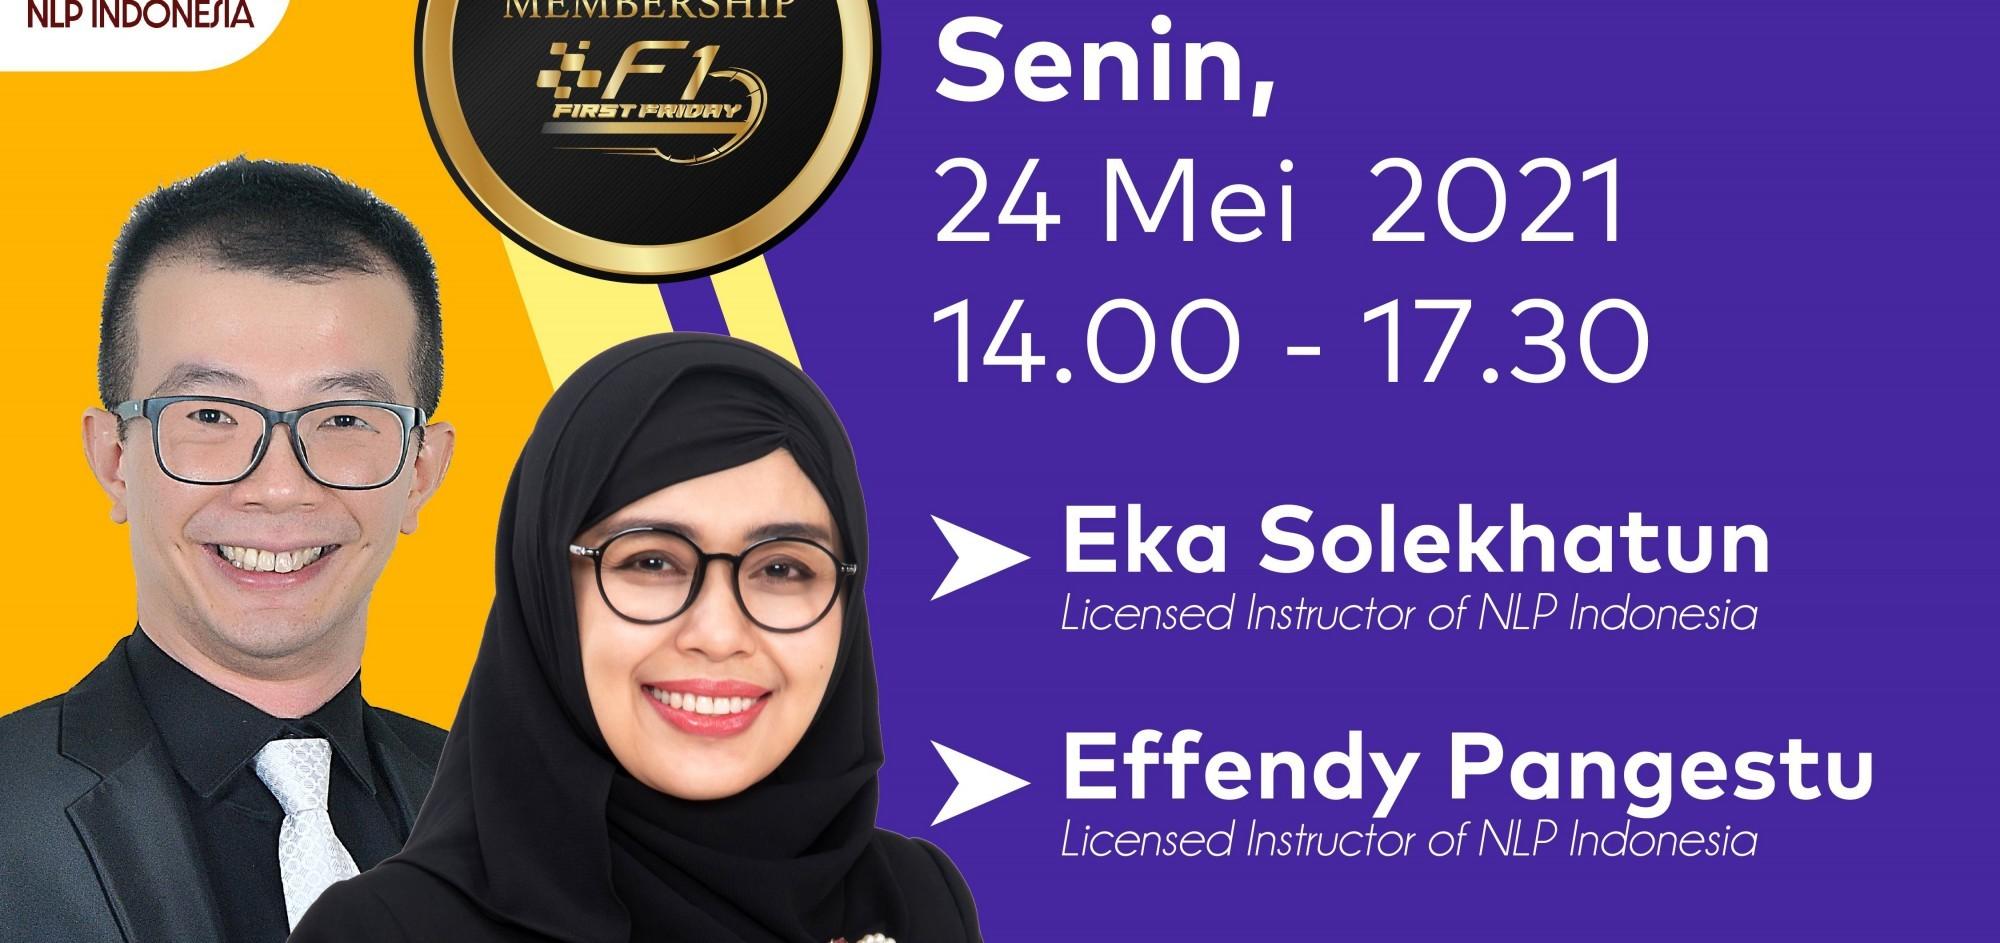 Smart Selling From Home With Eka Solekhatun & Effendy Pangestu Batch 40